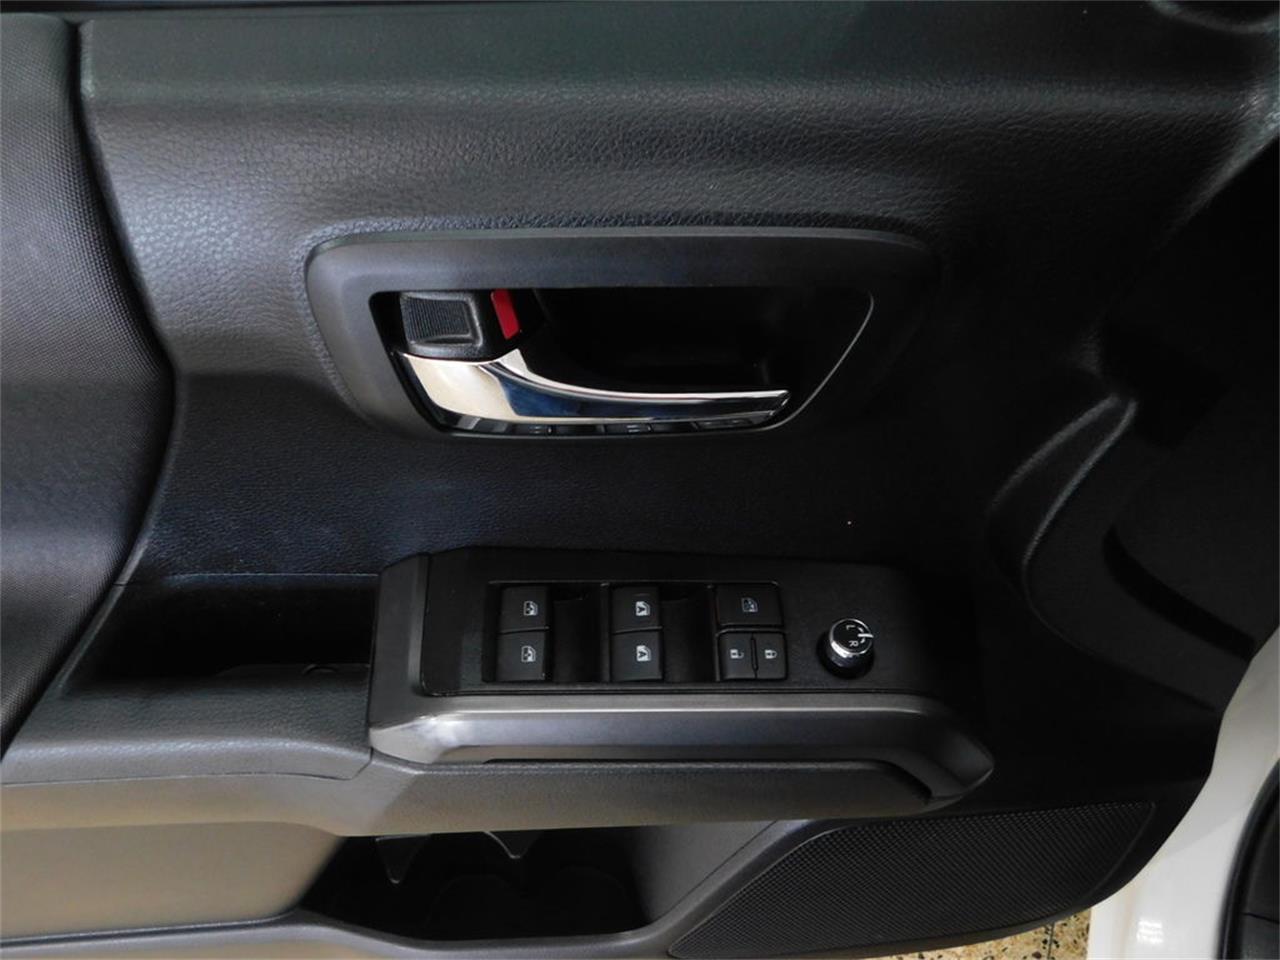 2017 Toyota Tacoma (CC-1334885) for sale in Hamburg, New York